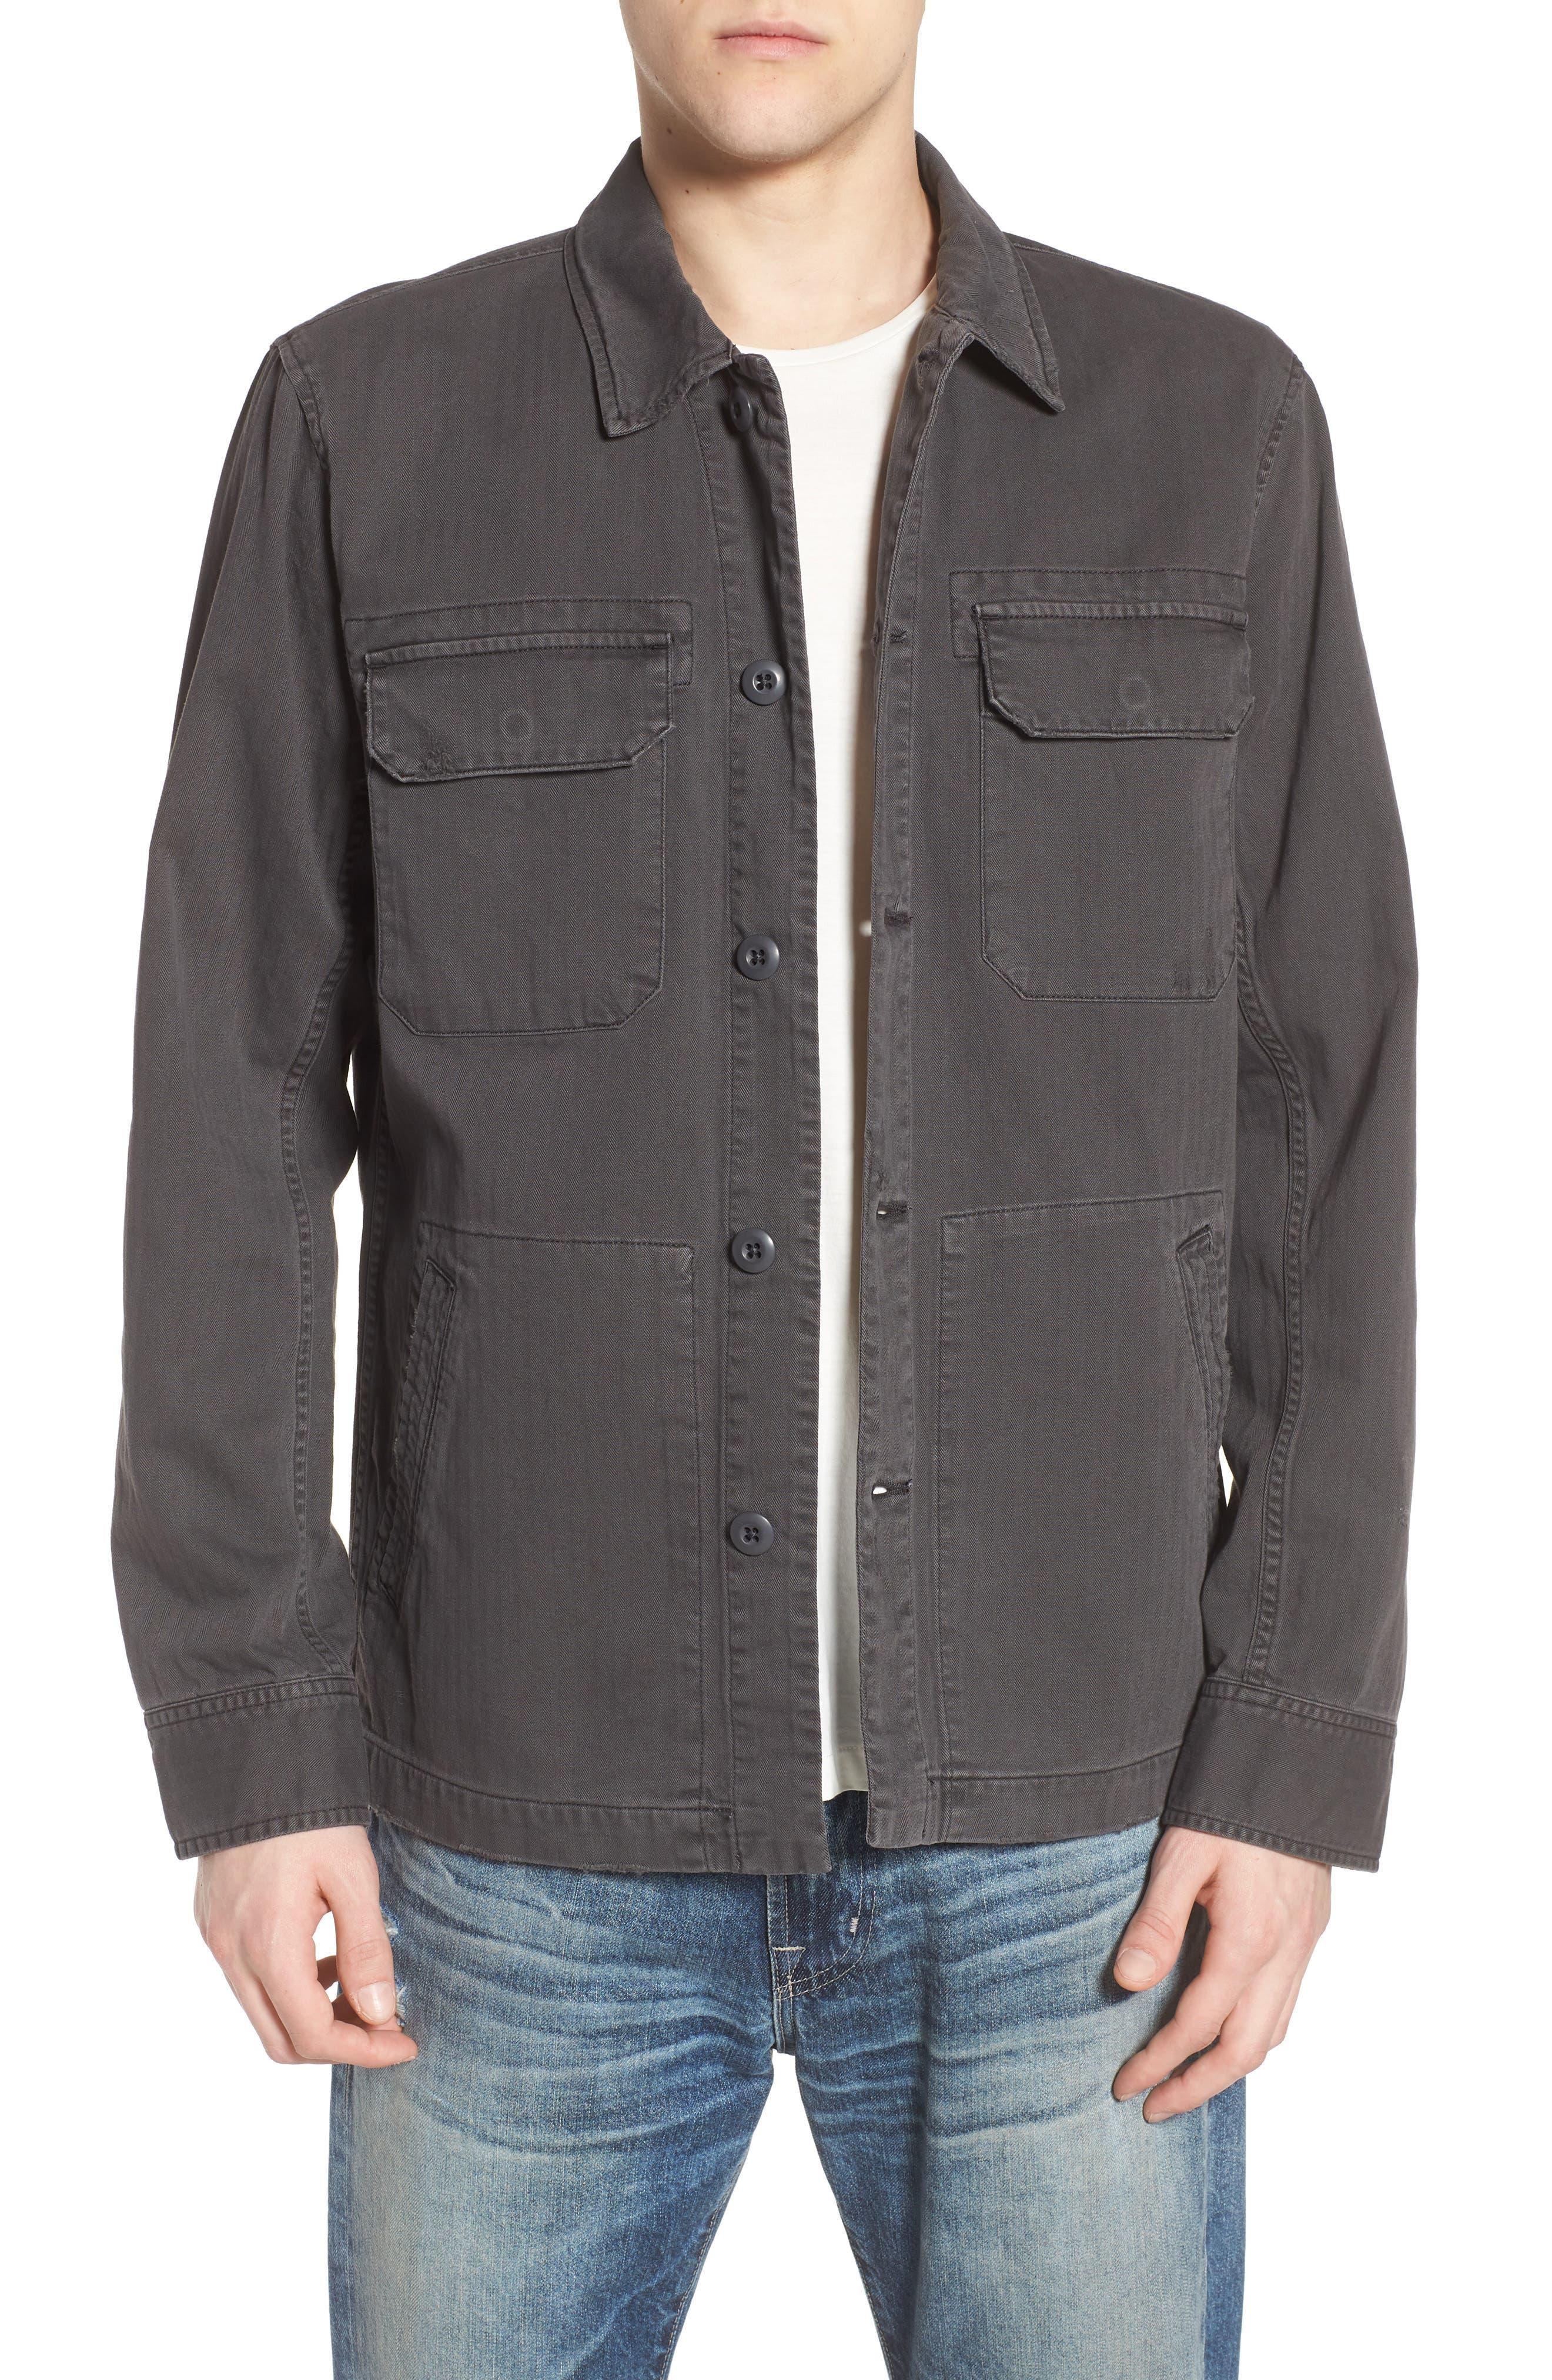 Marx Slim Fit Jacket,                         Main,                         color, 5 Years Pigment Smoke Grey